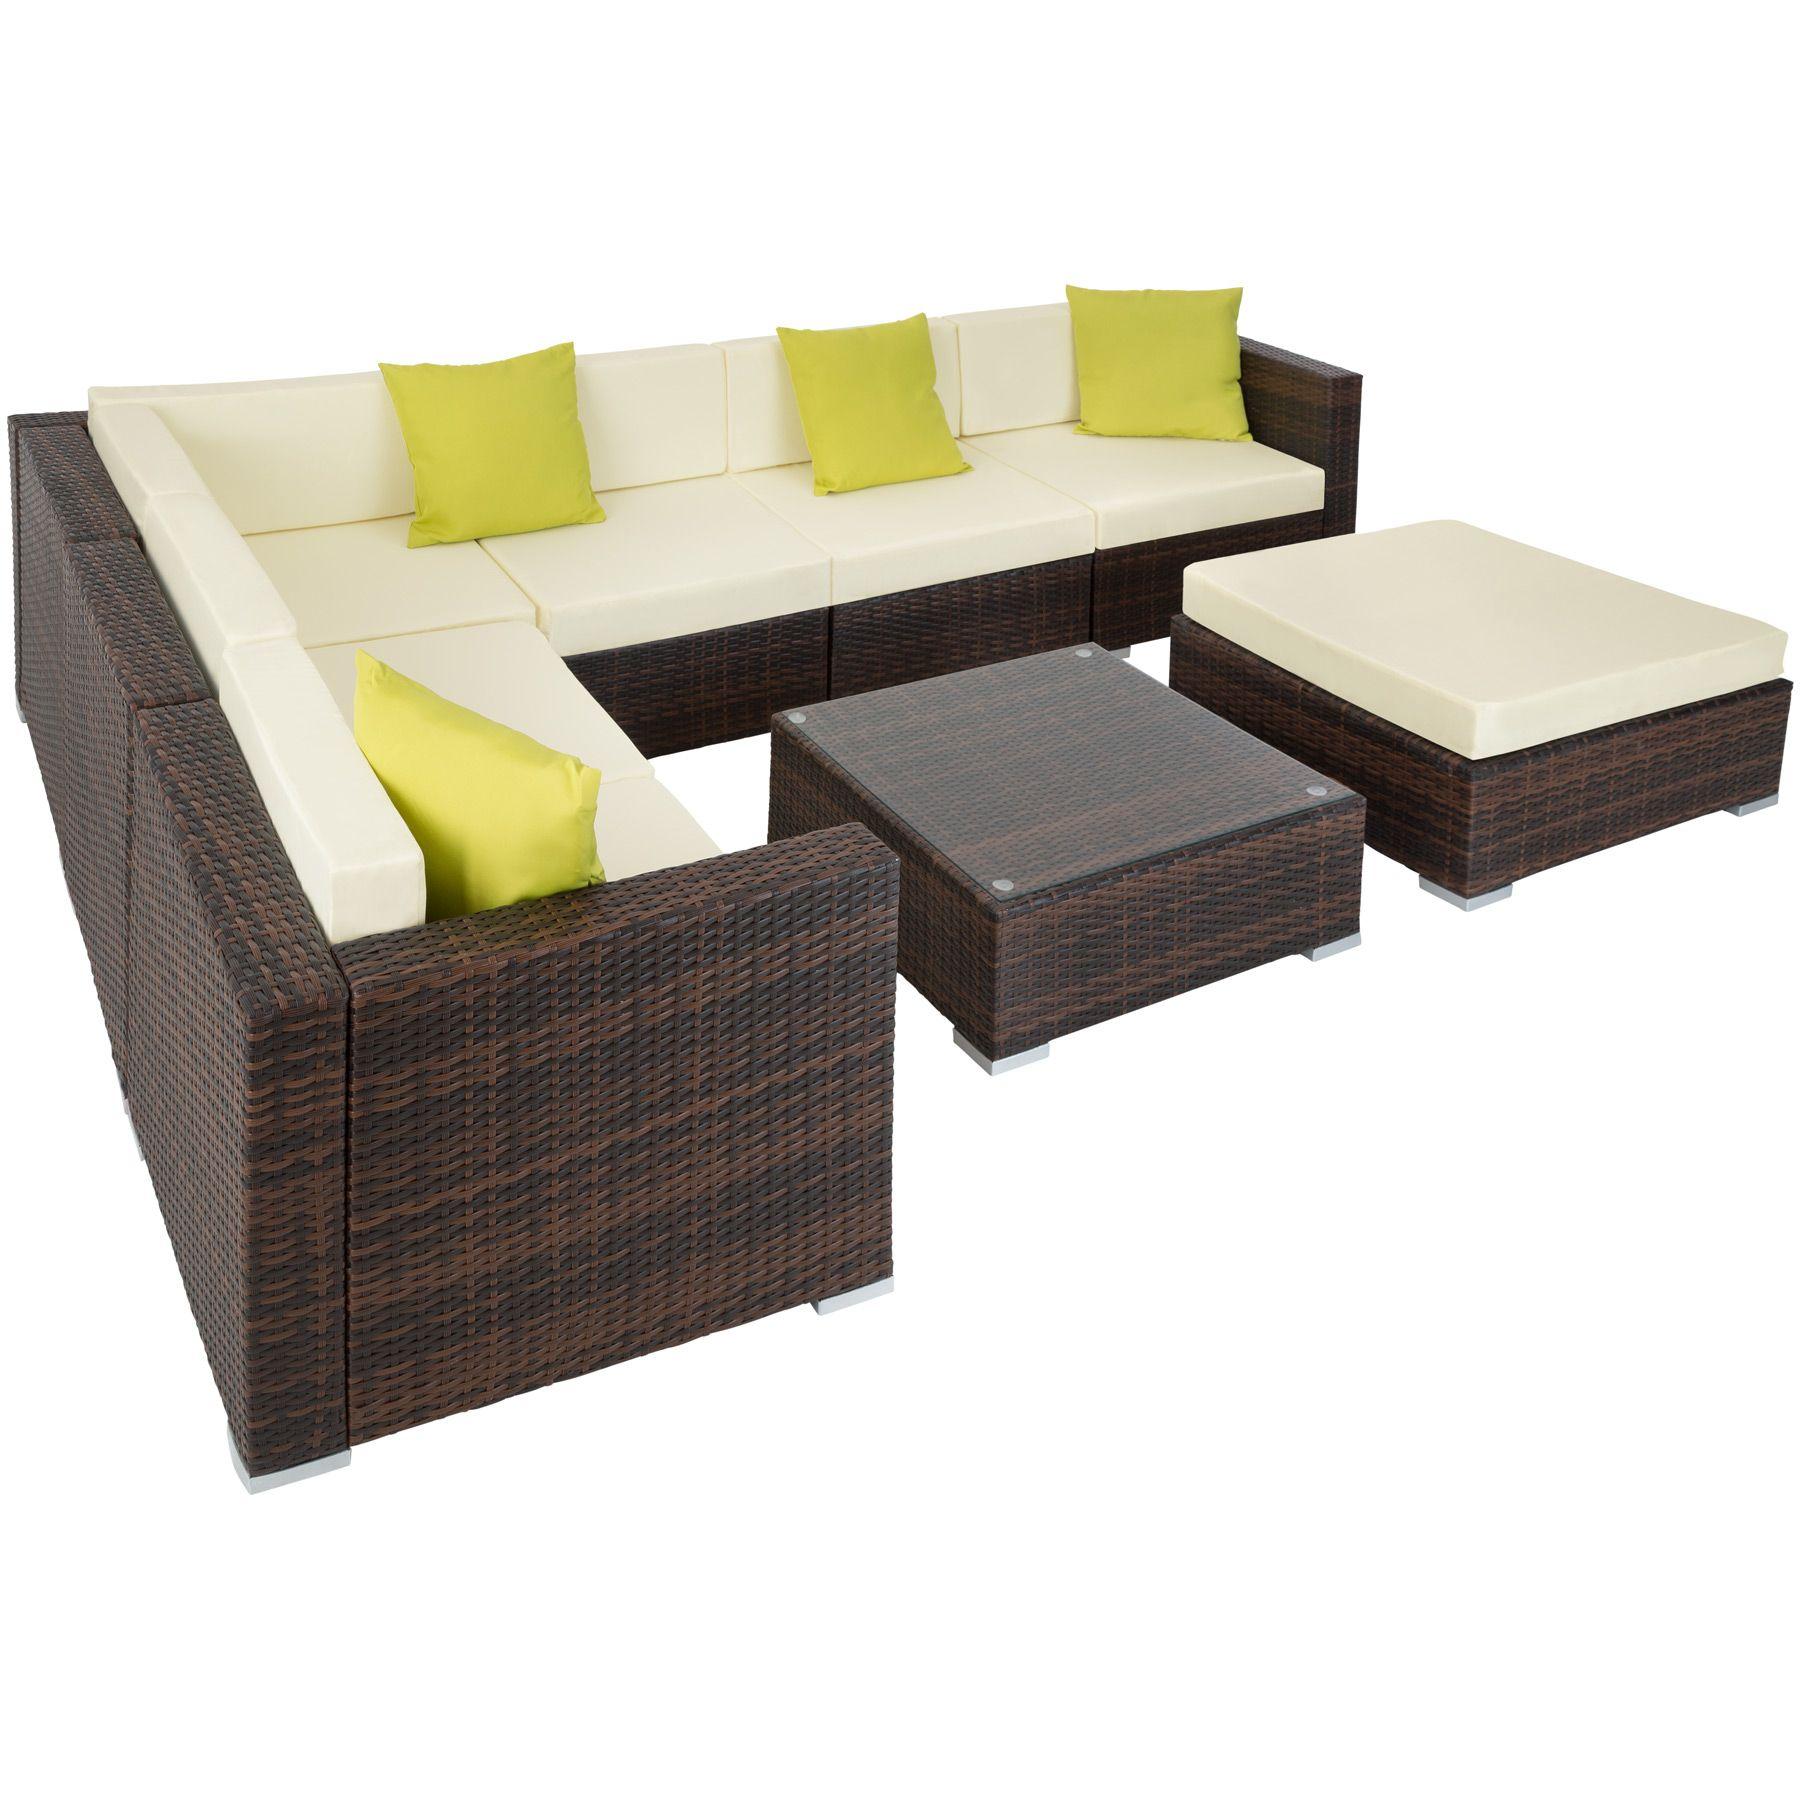 Alu Poly Rattan Sitzgruppe Lounge Rattanmöbel Gartenmöbel Sofa Tisch ...